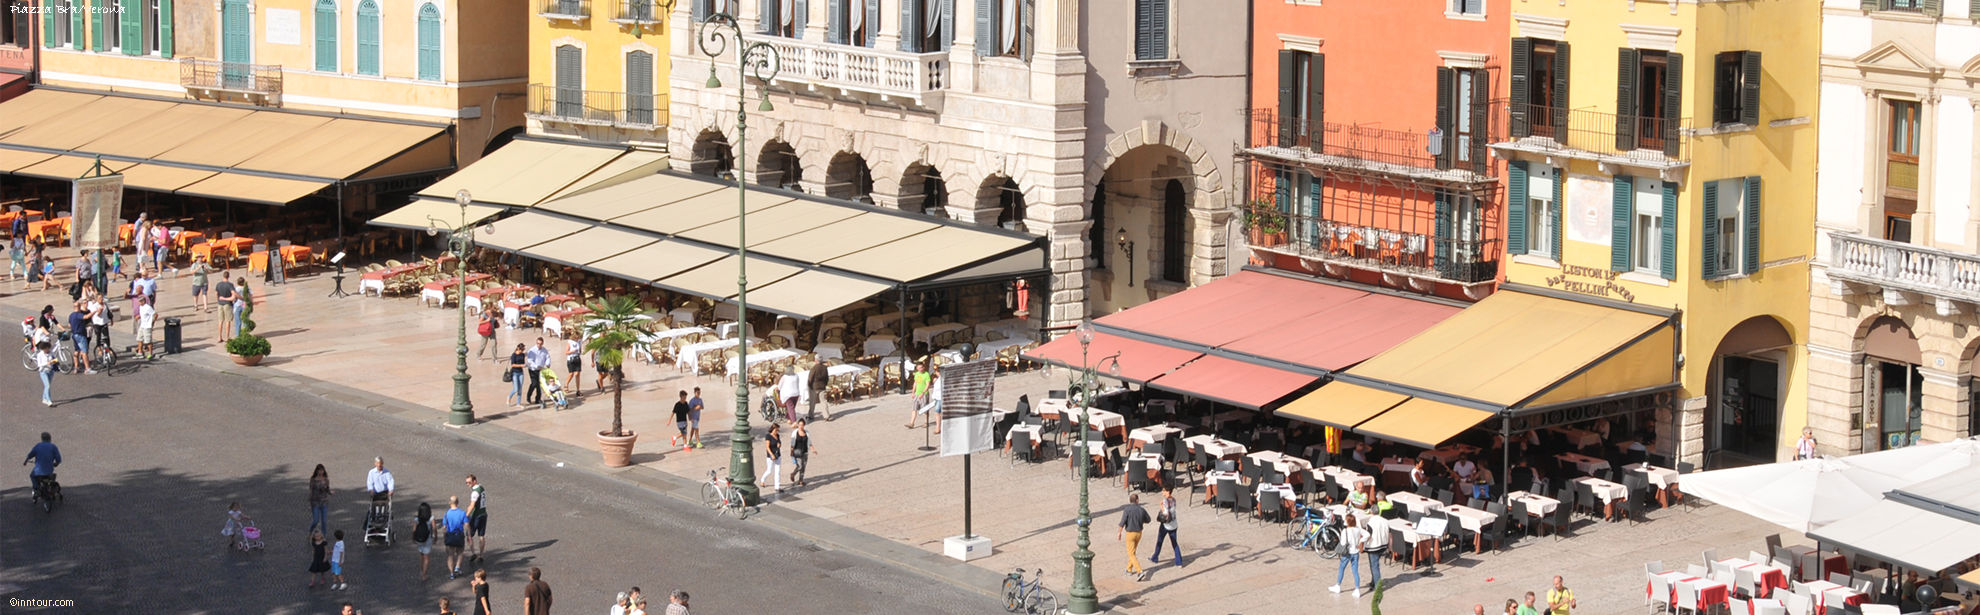 Osportinntour_Piazza-Bra_Verona_DSC_0977